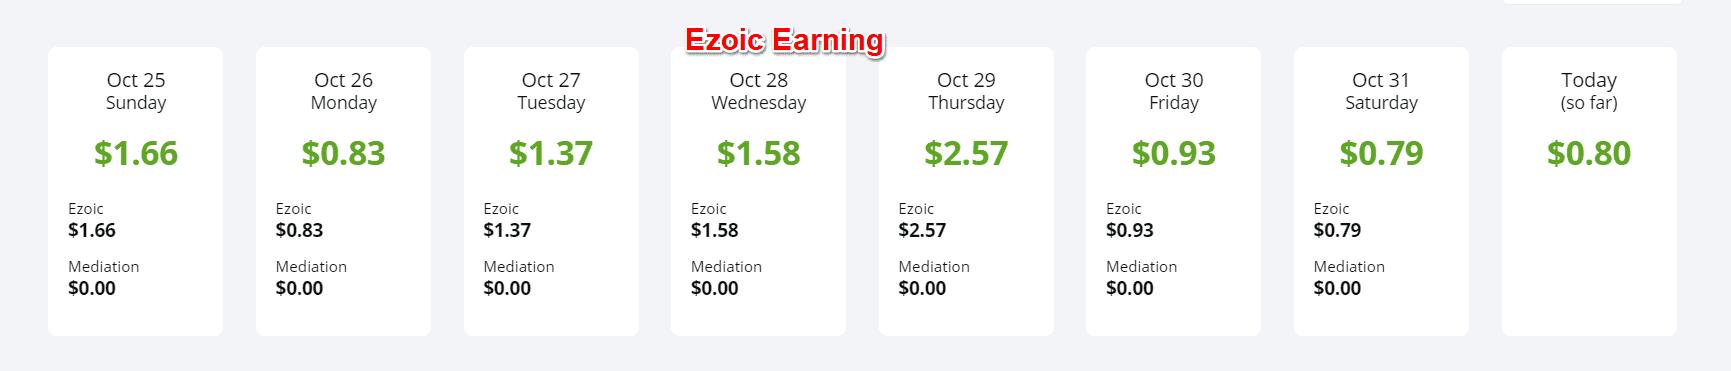 Ezoic Earning increased